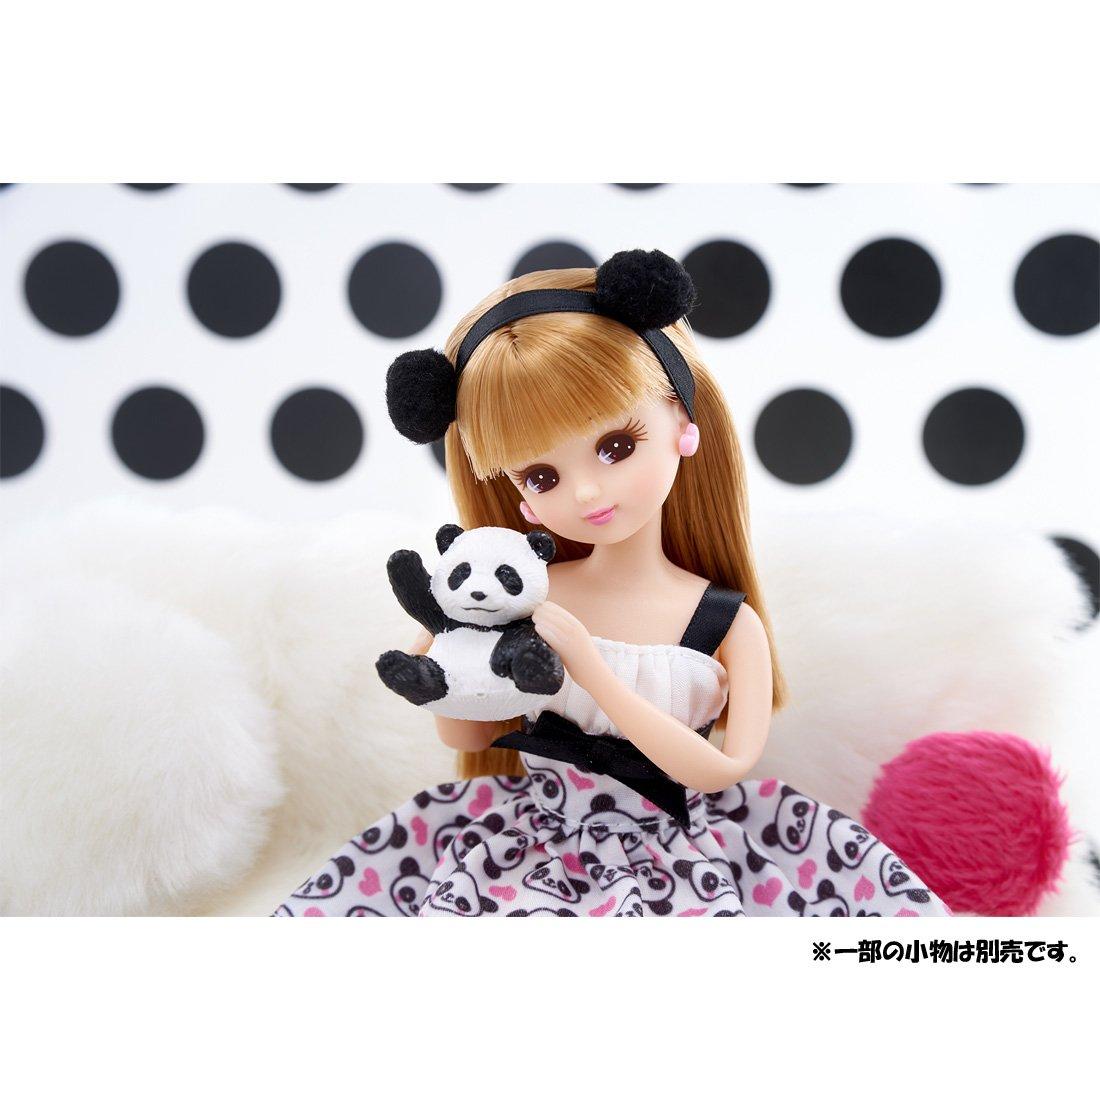 Takara Tomy Licca-chan LD-07 Chao Chao Panda Doll NEW